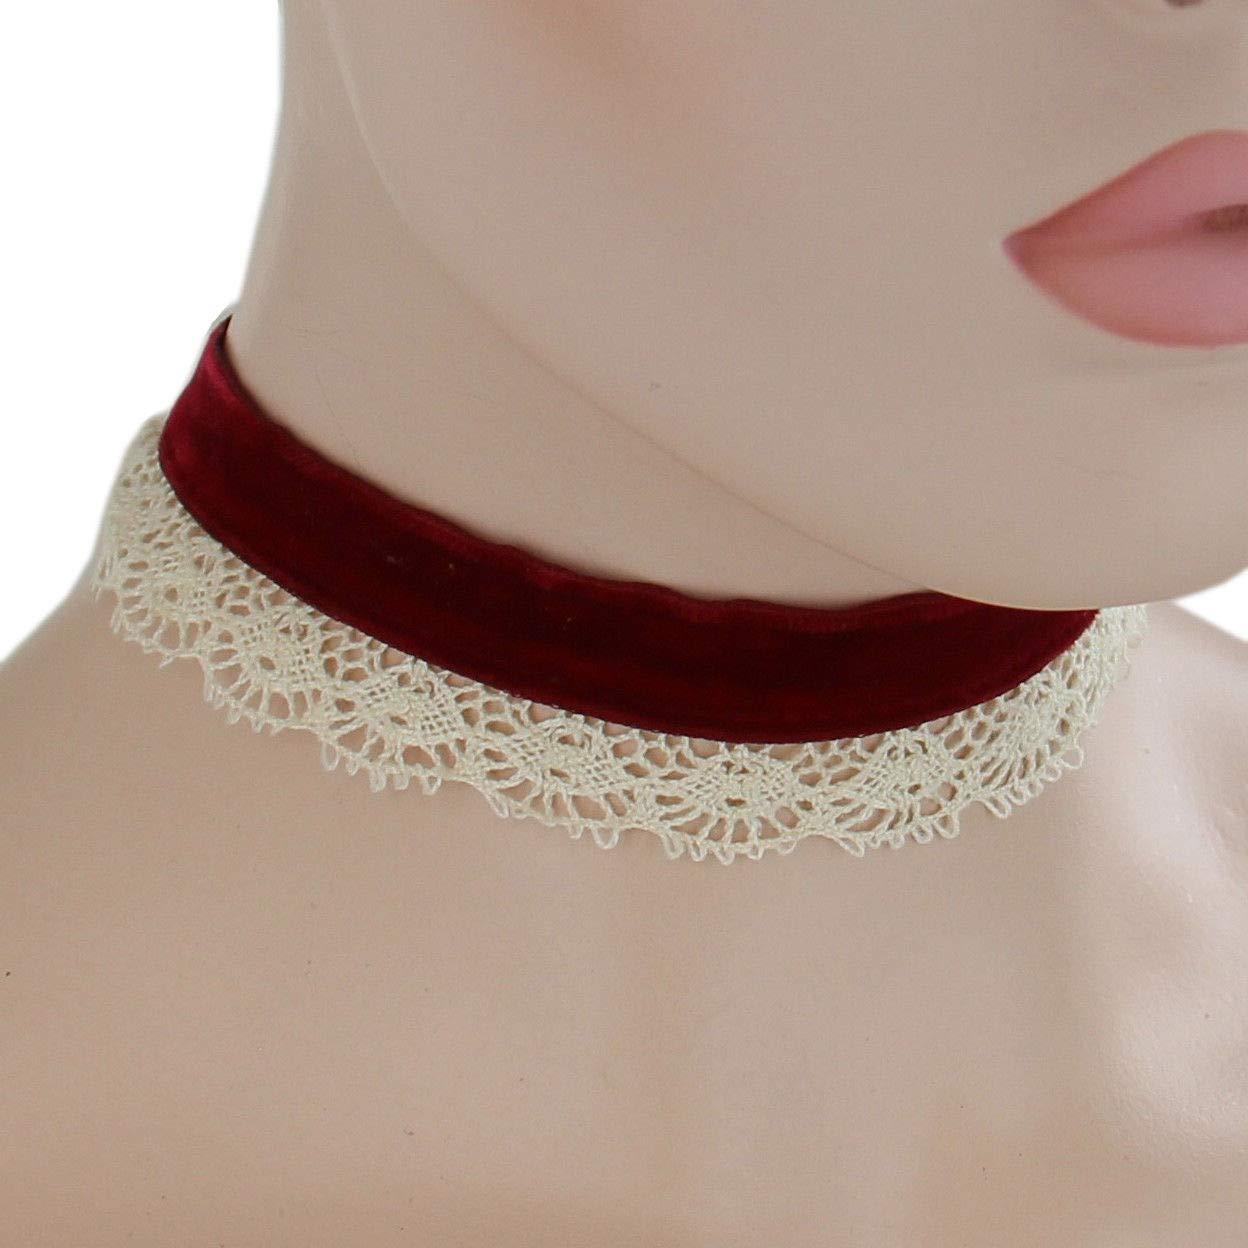 Web /& Lace Collar Necklace